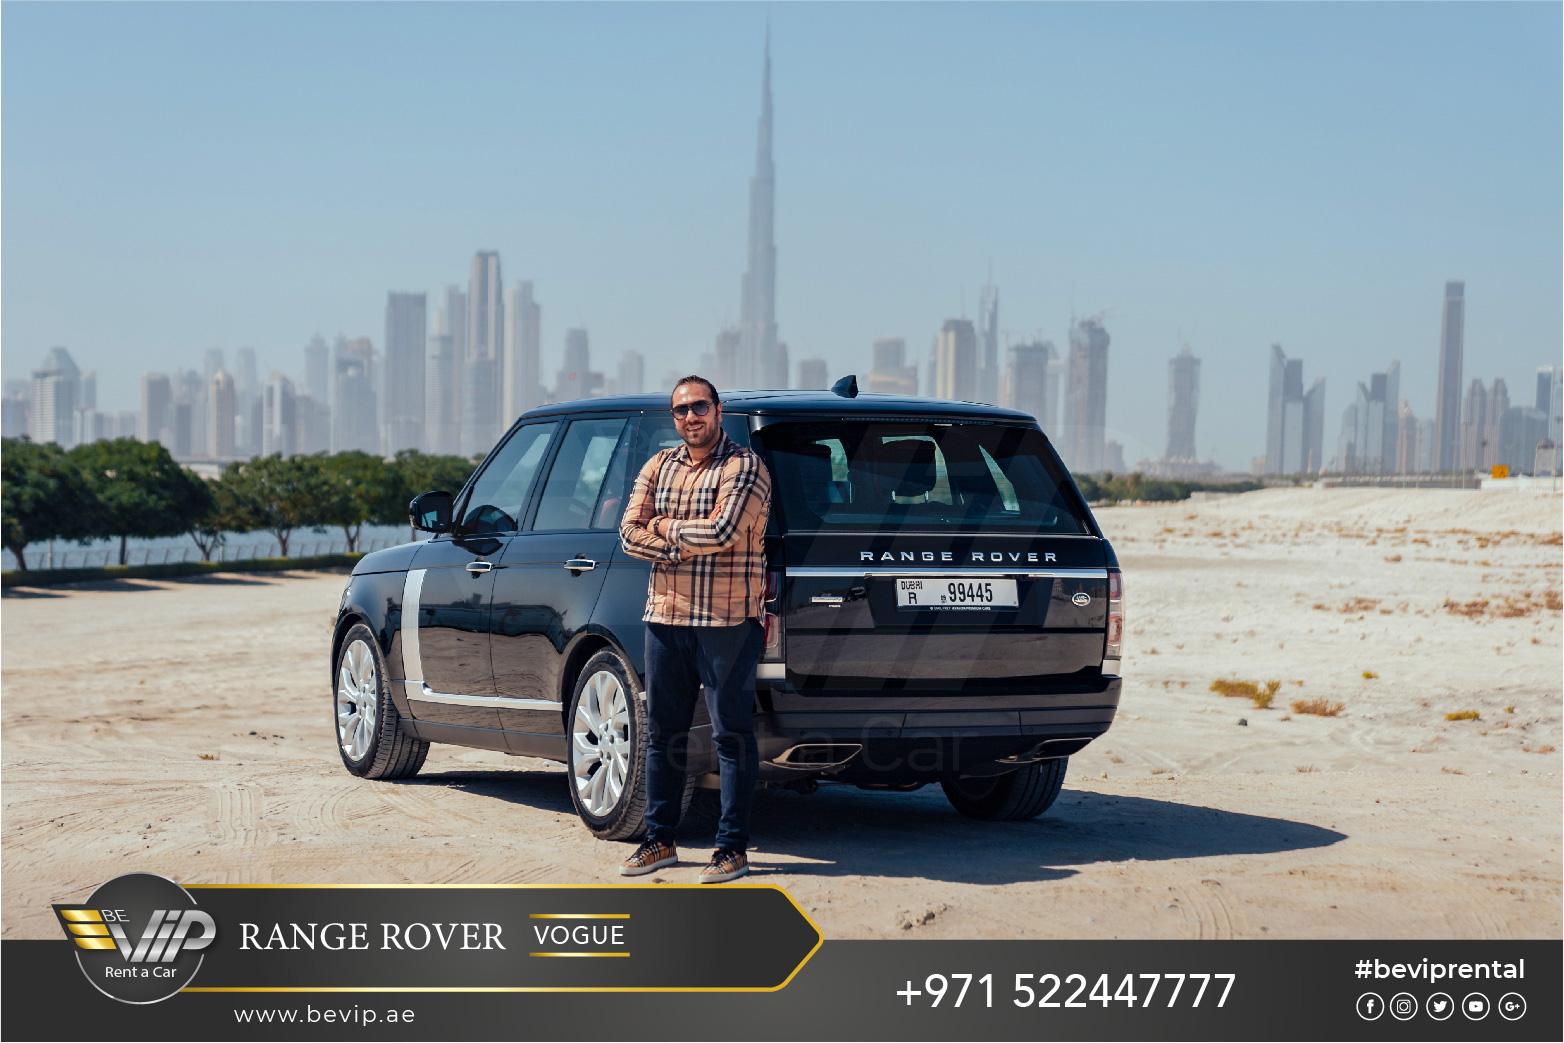 Luxury-car-rental-in-dubai_Range-Rover-for-rent-in-Dubai_-13.jpg